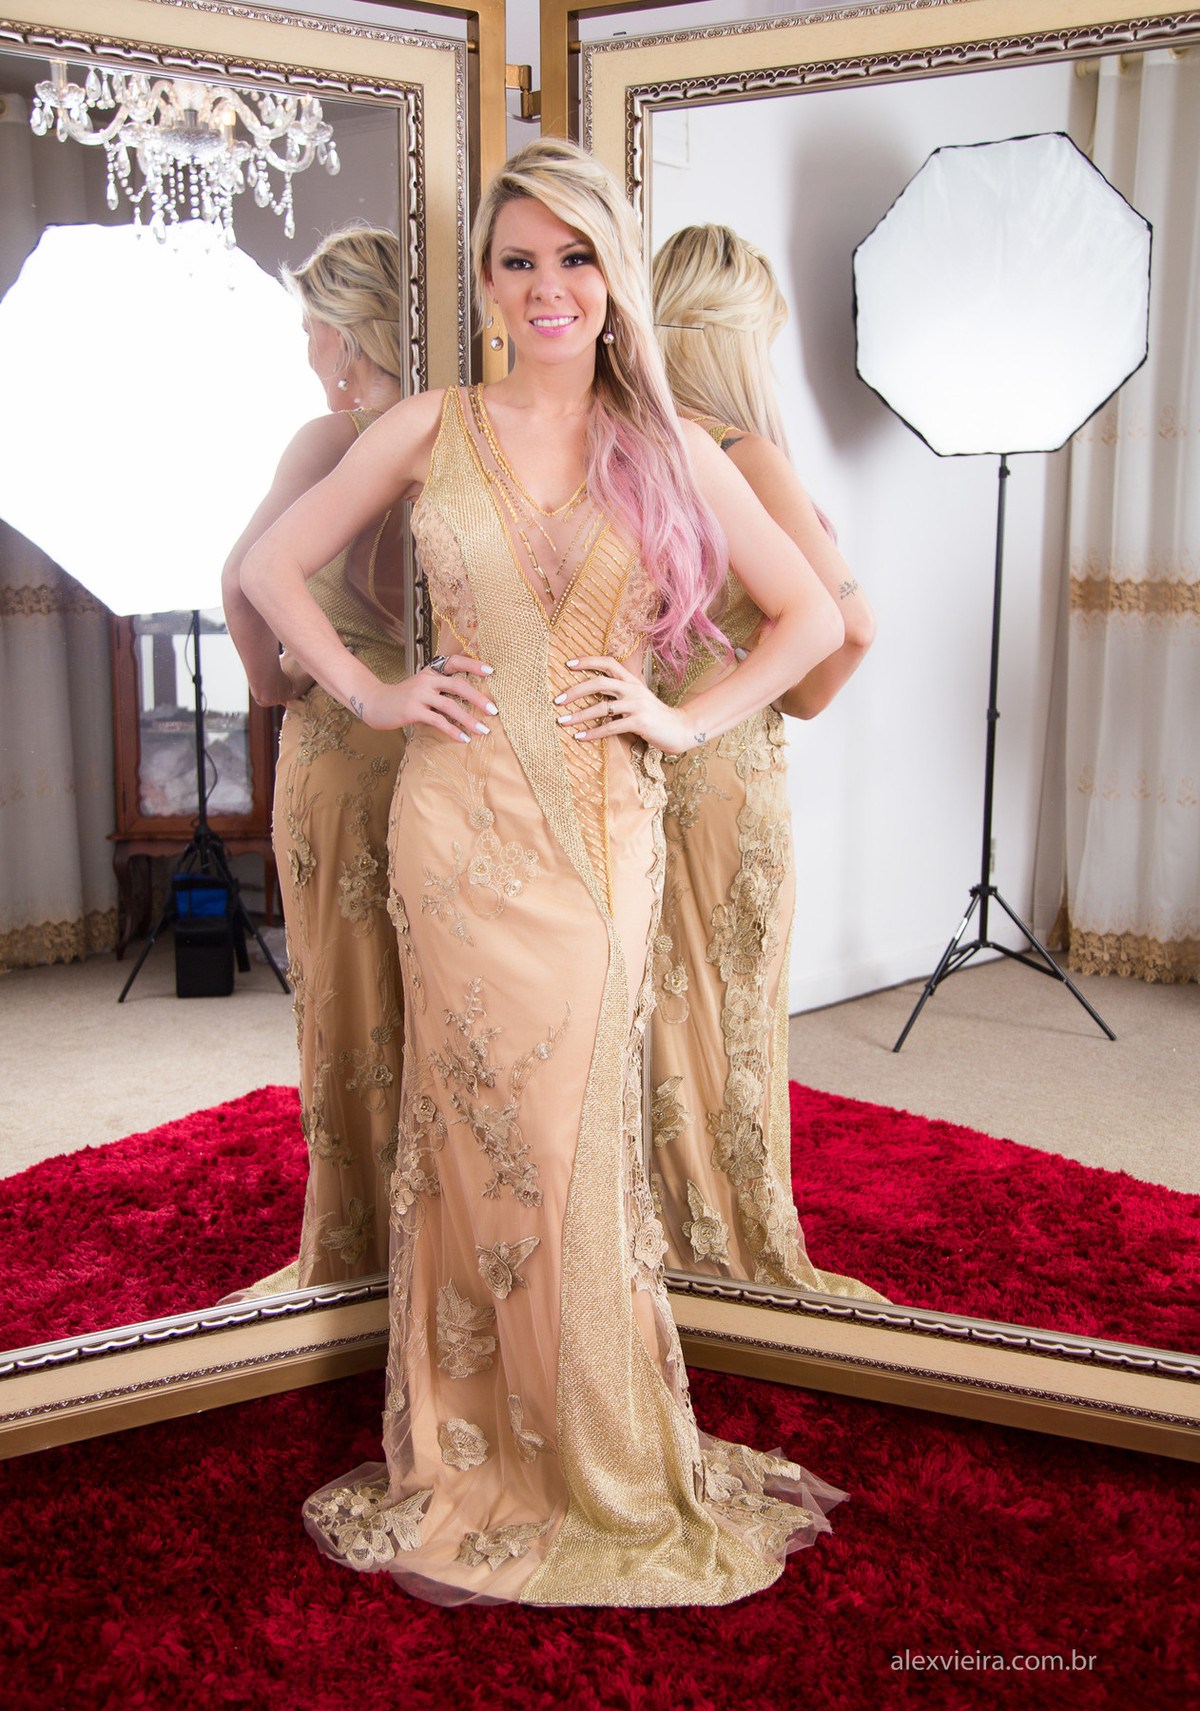 a atriz e modelo Youtuber @yakarapiotto